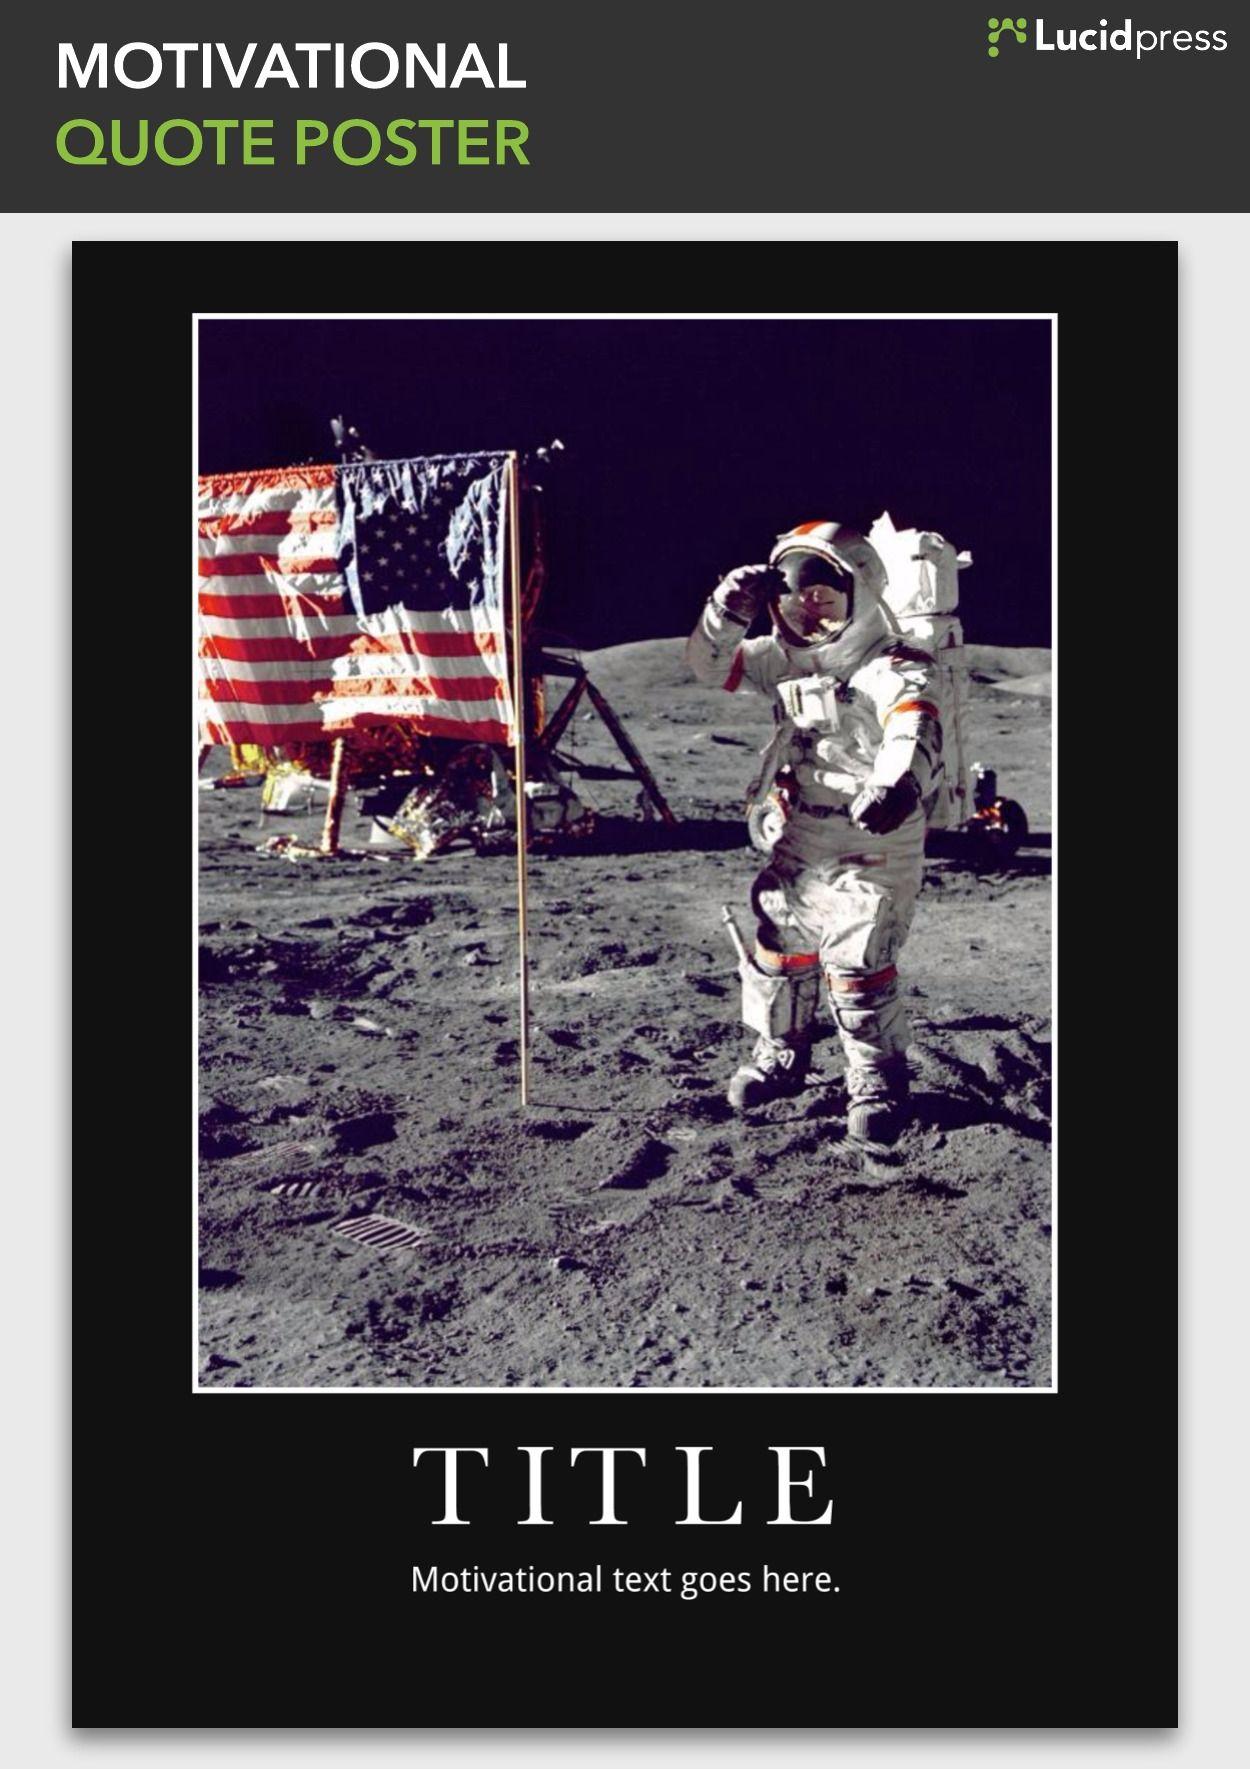 Motivational Quote Poster Template Branding Design Pinterest